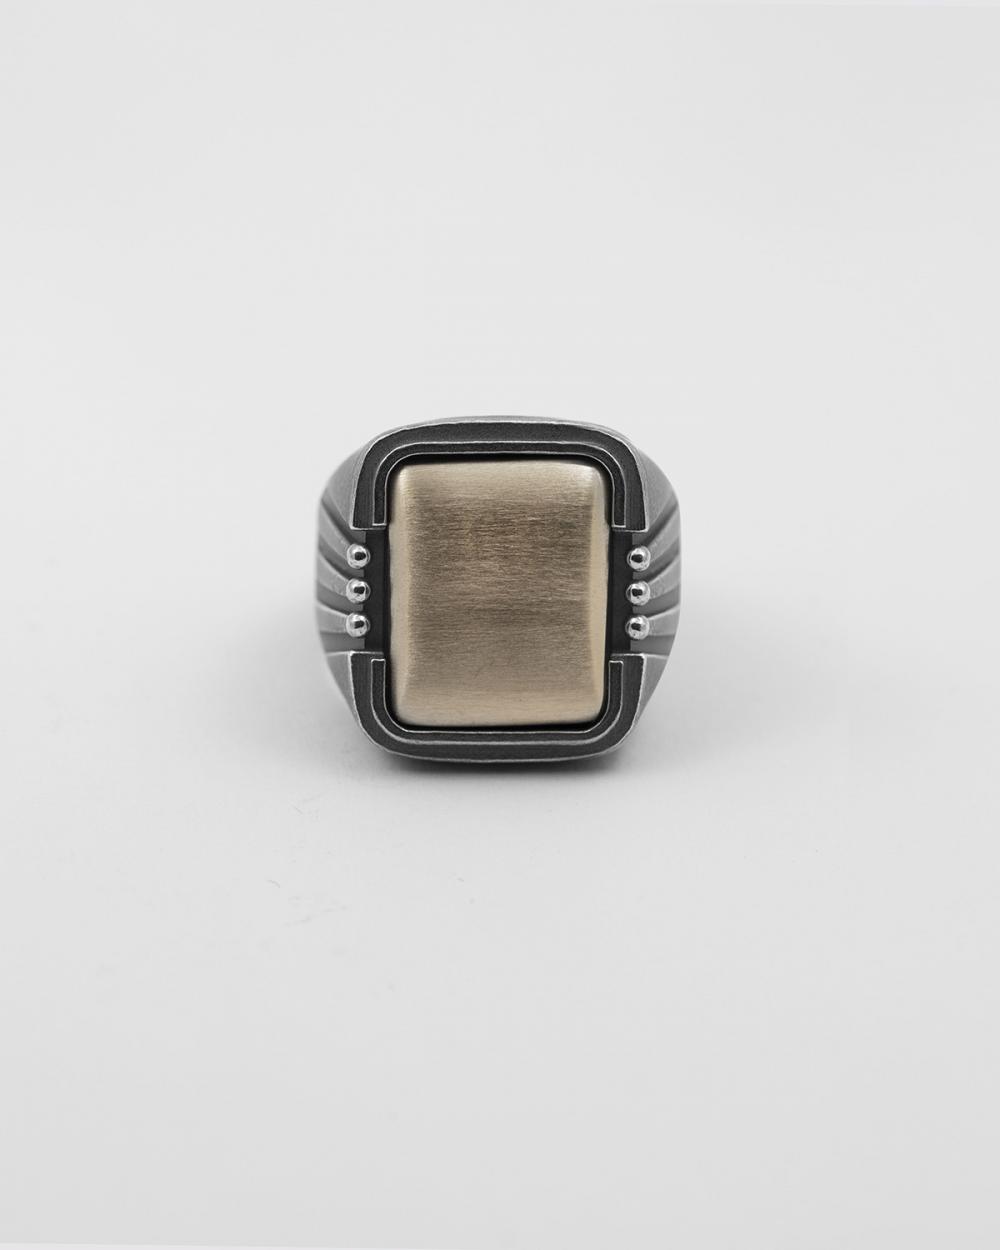 native rays broze signet ring